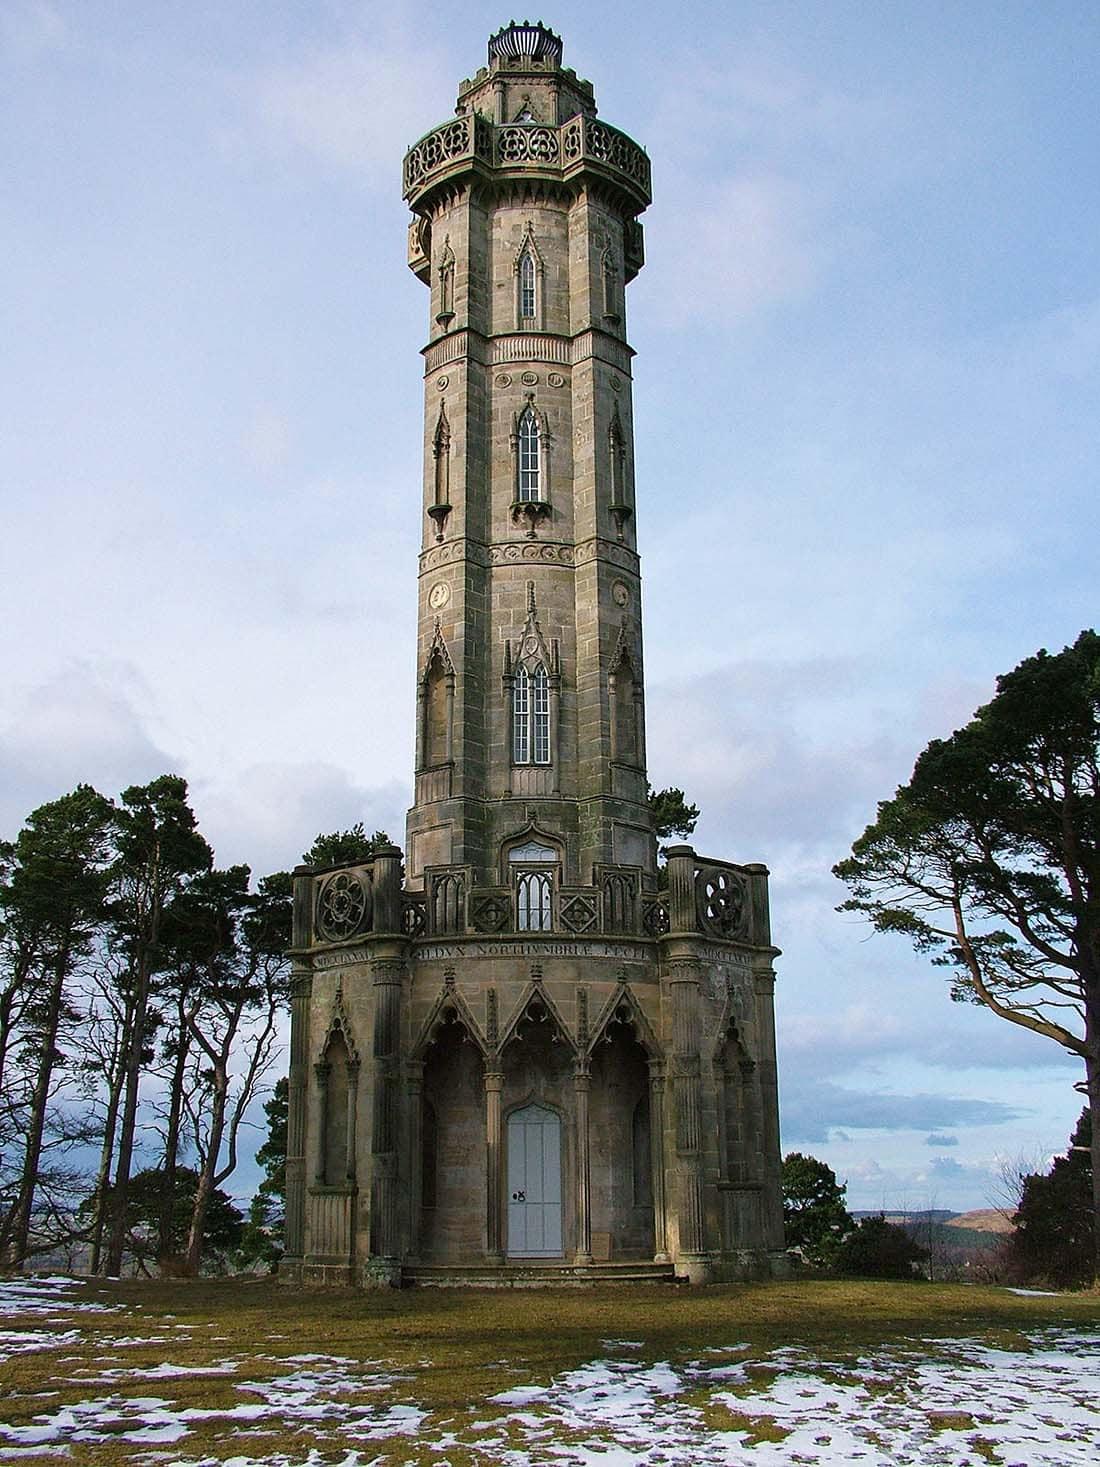 Brizlee Tower